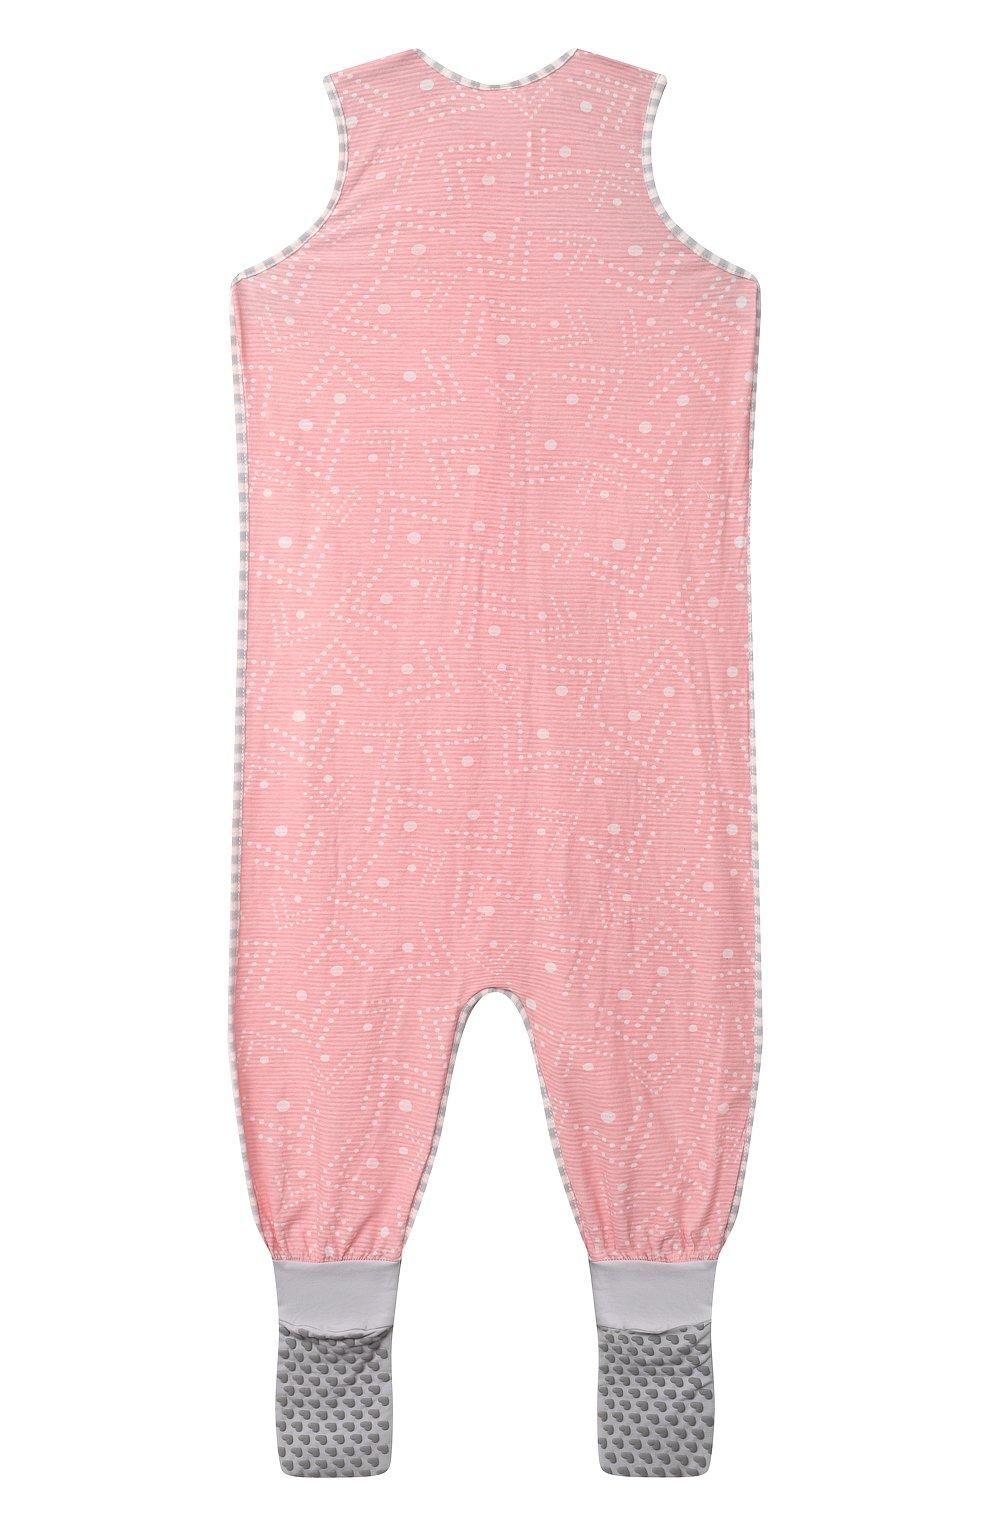 Детский хлопковый комбинезон LOVE TO DREAM розового цвета, арт. L40 16 088 PNK 24M | Фото 2